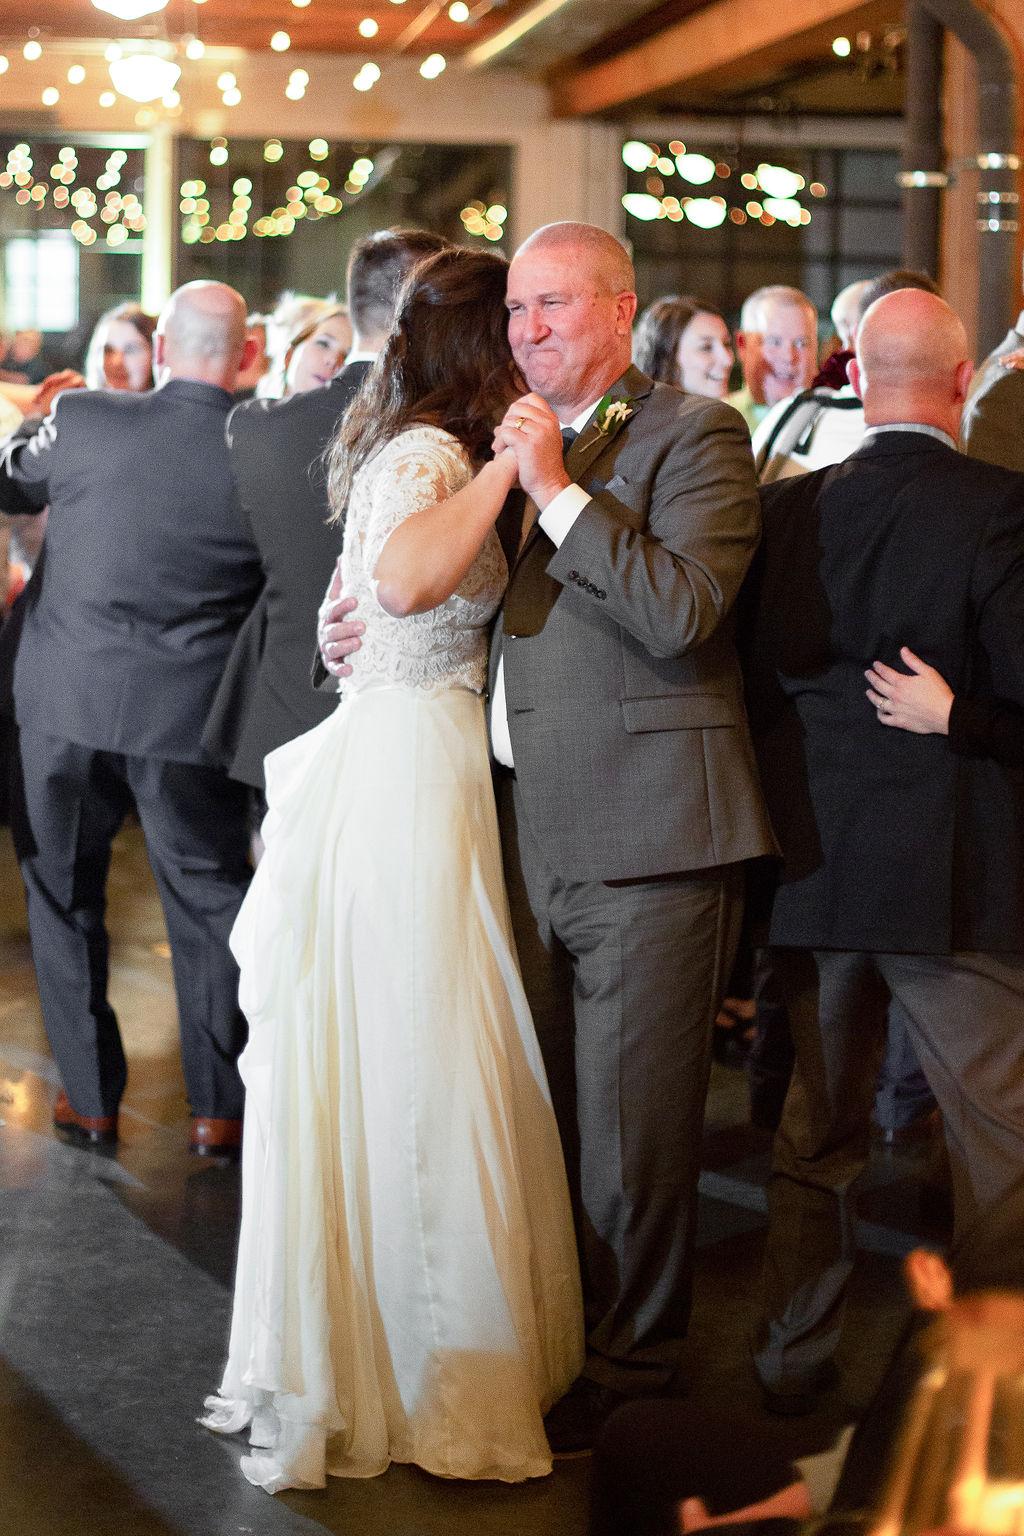 035_reception_portland,oregon,castaway,wedding,by_outlive_creative,photo,and,video.jpg